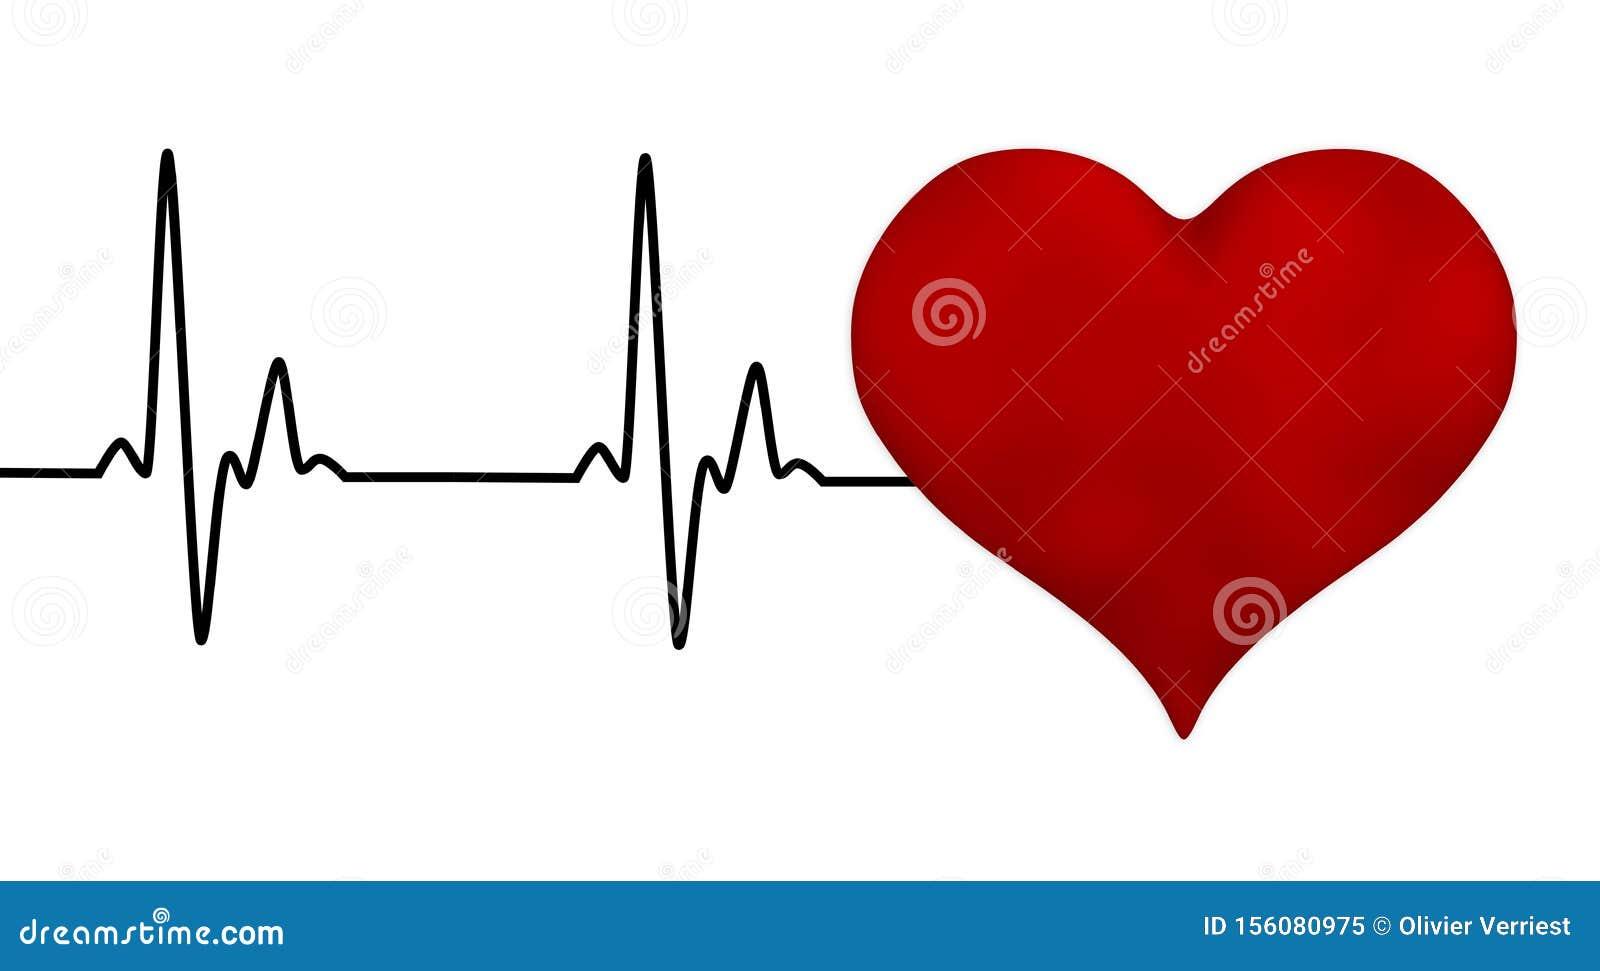 Electrocardiogram heartbeat pulse heart background